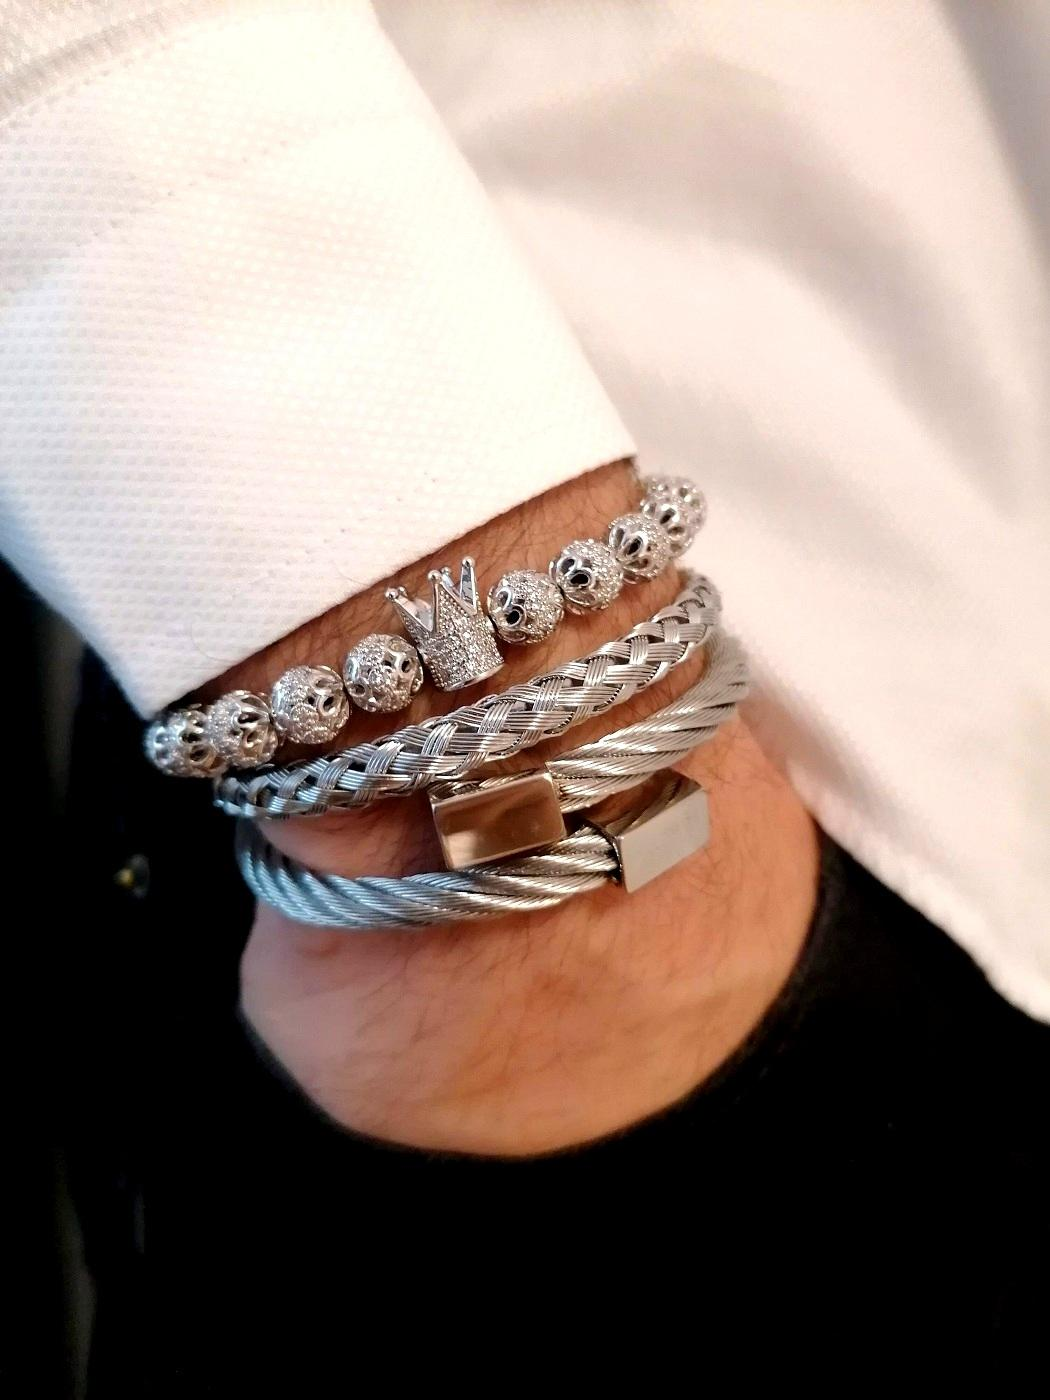 Royal Crown Bracelet, Royal Crown Bracelets, Soccer King Bracelet, Soccer King Bracelet Mens, Soccer King Bracelets, Wrist Beads For Guys, His Queen And Her King Bracelets, Real Diamond Bracelet Womens, His Queen Bracelet, Mens Beaded Bracelets Cheap, Mens Cubic Zirconia Bracelet, Mens Beaded Bracelets Amazon, All Diamond Bracelet, Amazon Jewelry Silver Bracelets